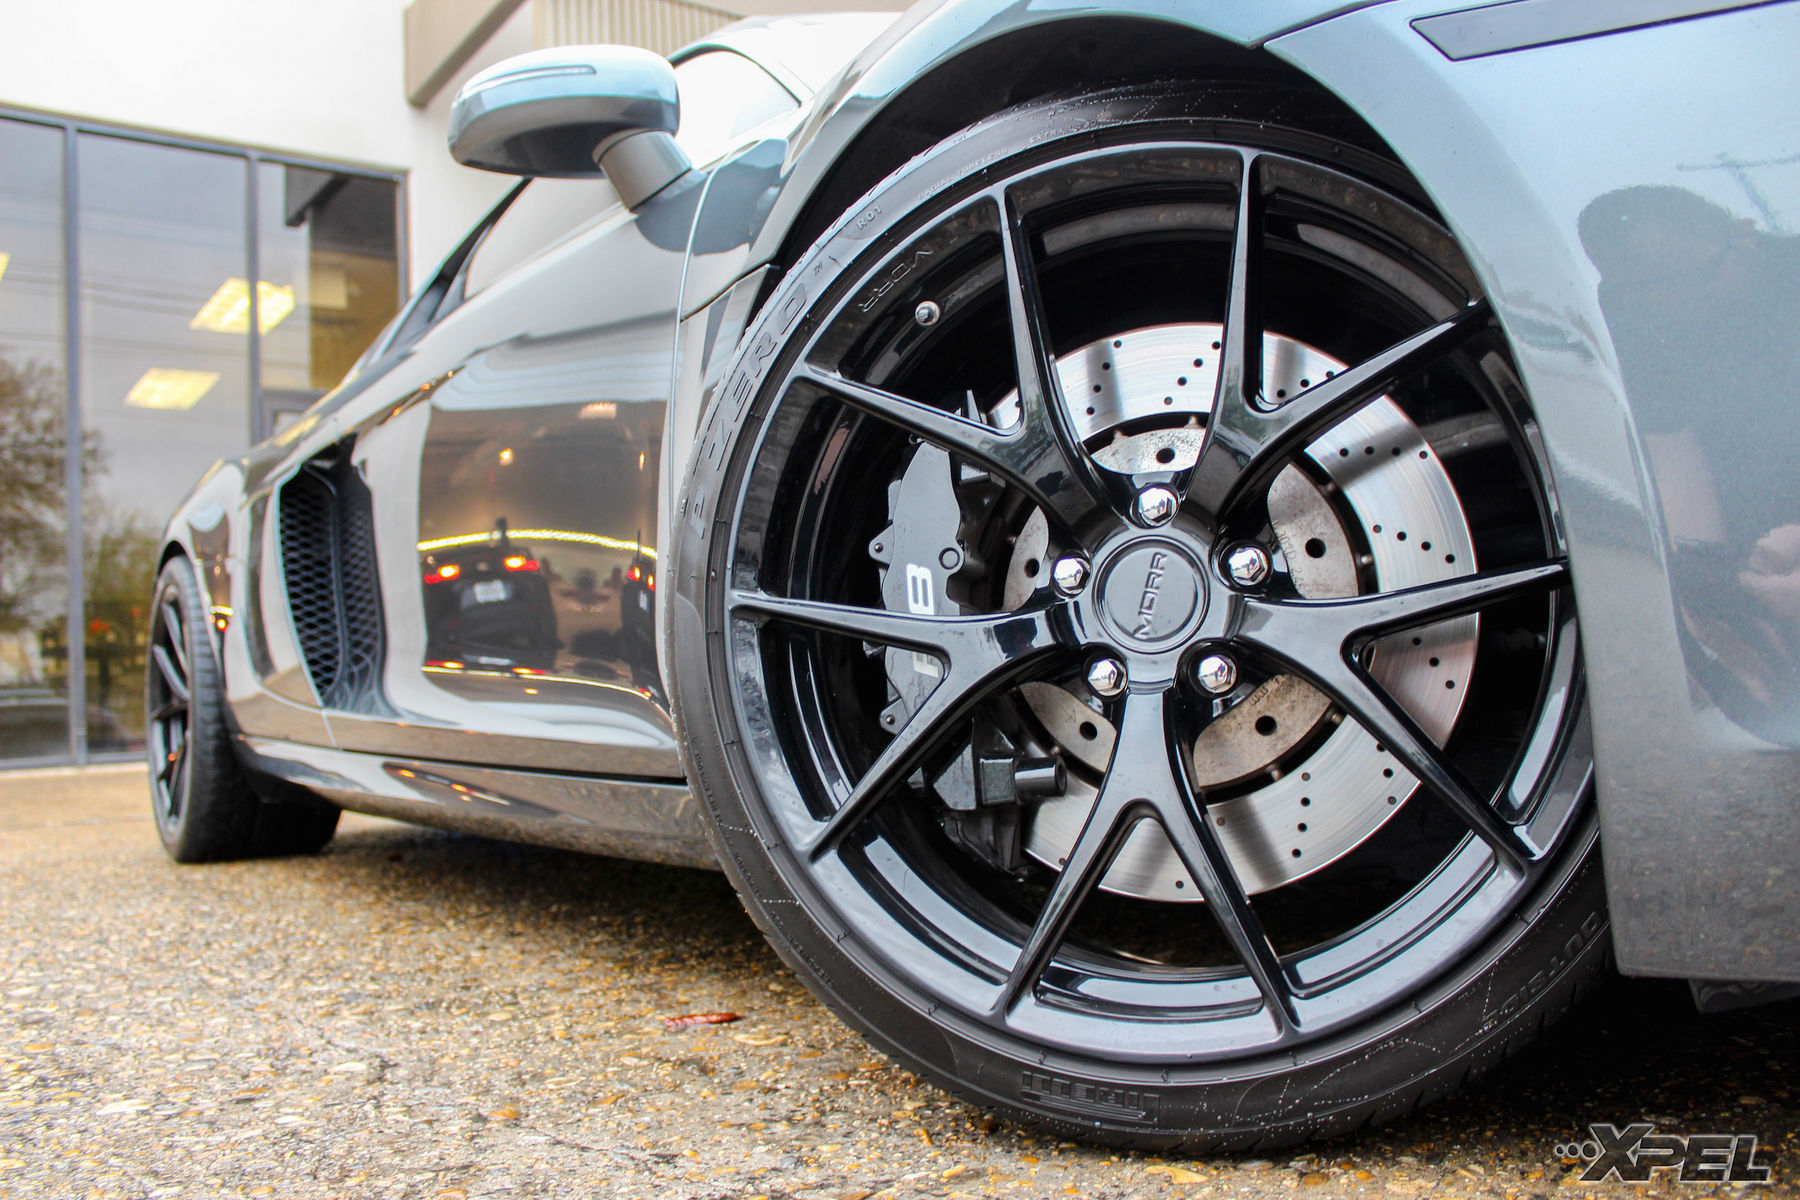 2011 Audi R8 | 2011 Audi R8